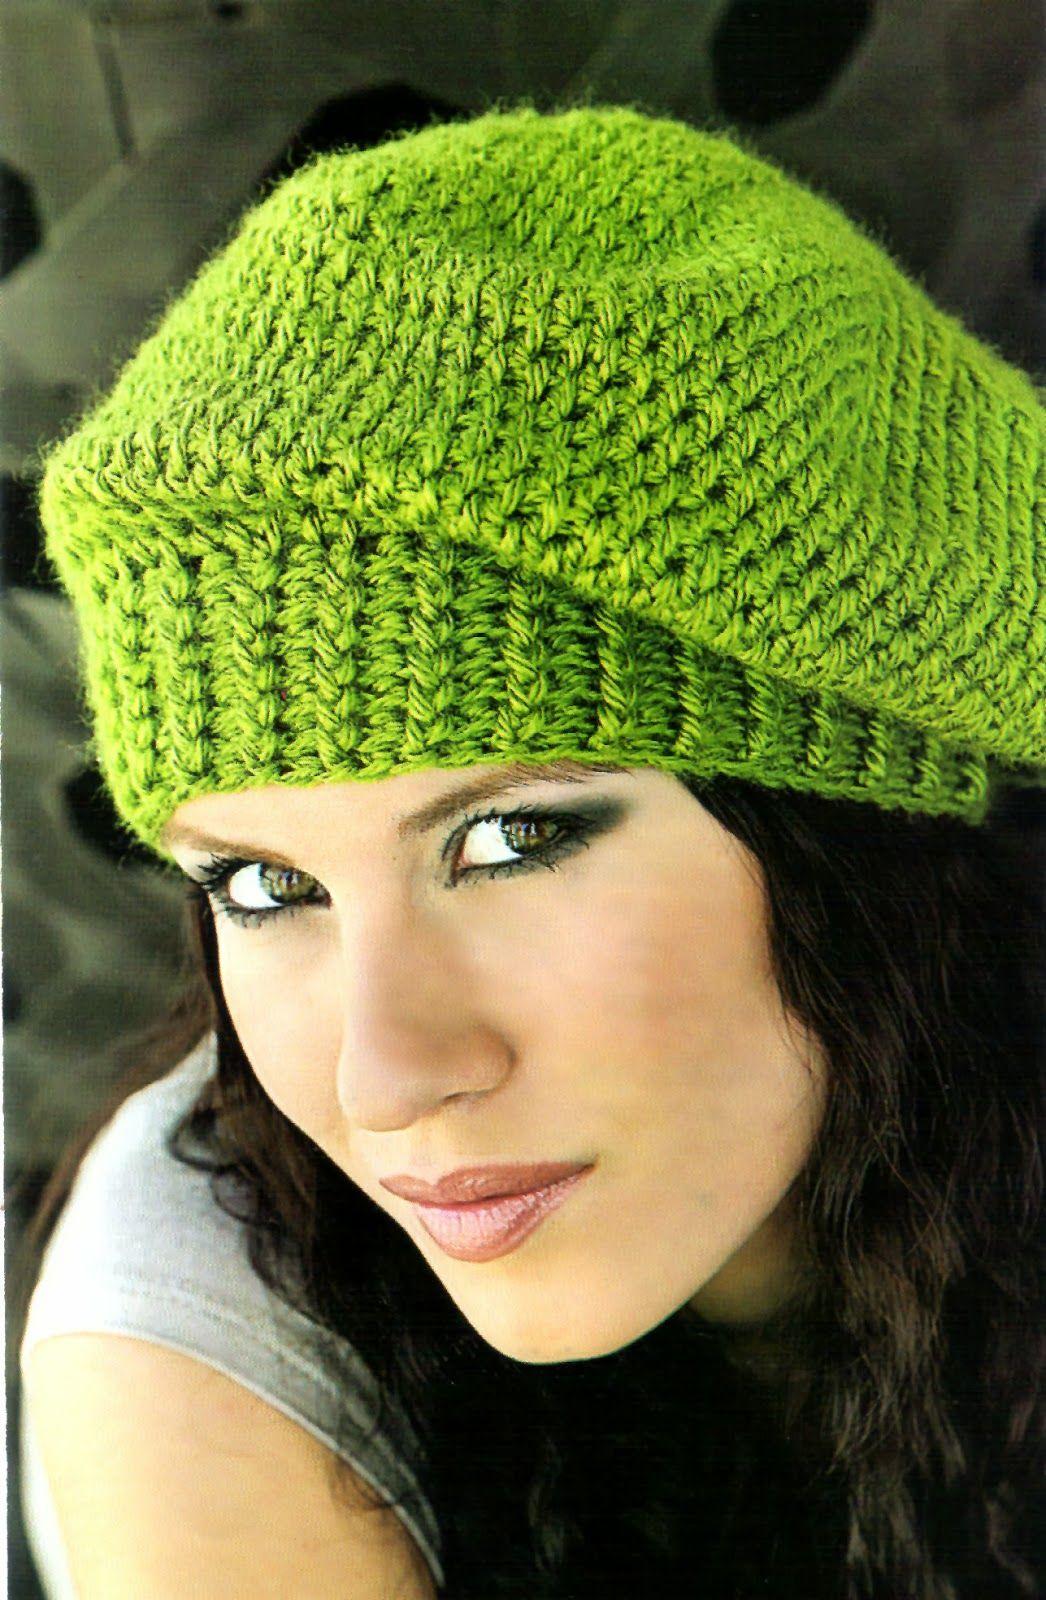 tejidos artesanales  boina tejida en crochet  41862dccfa6